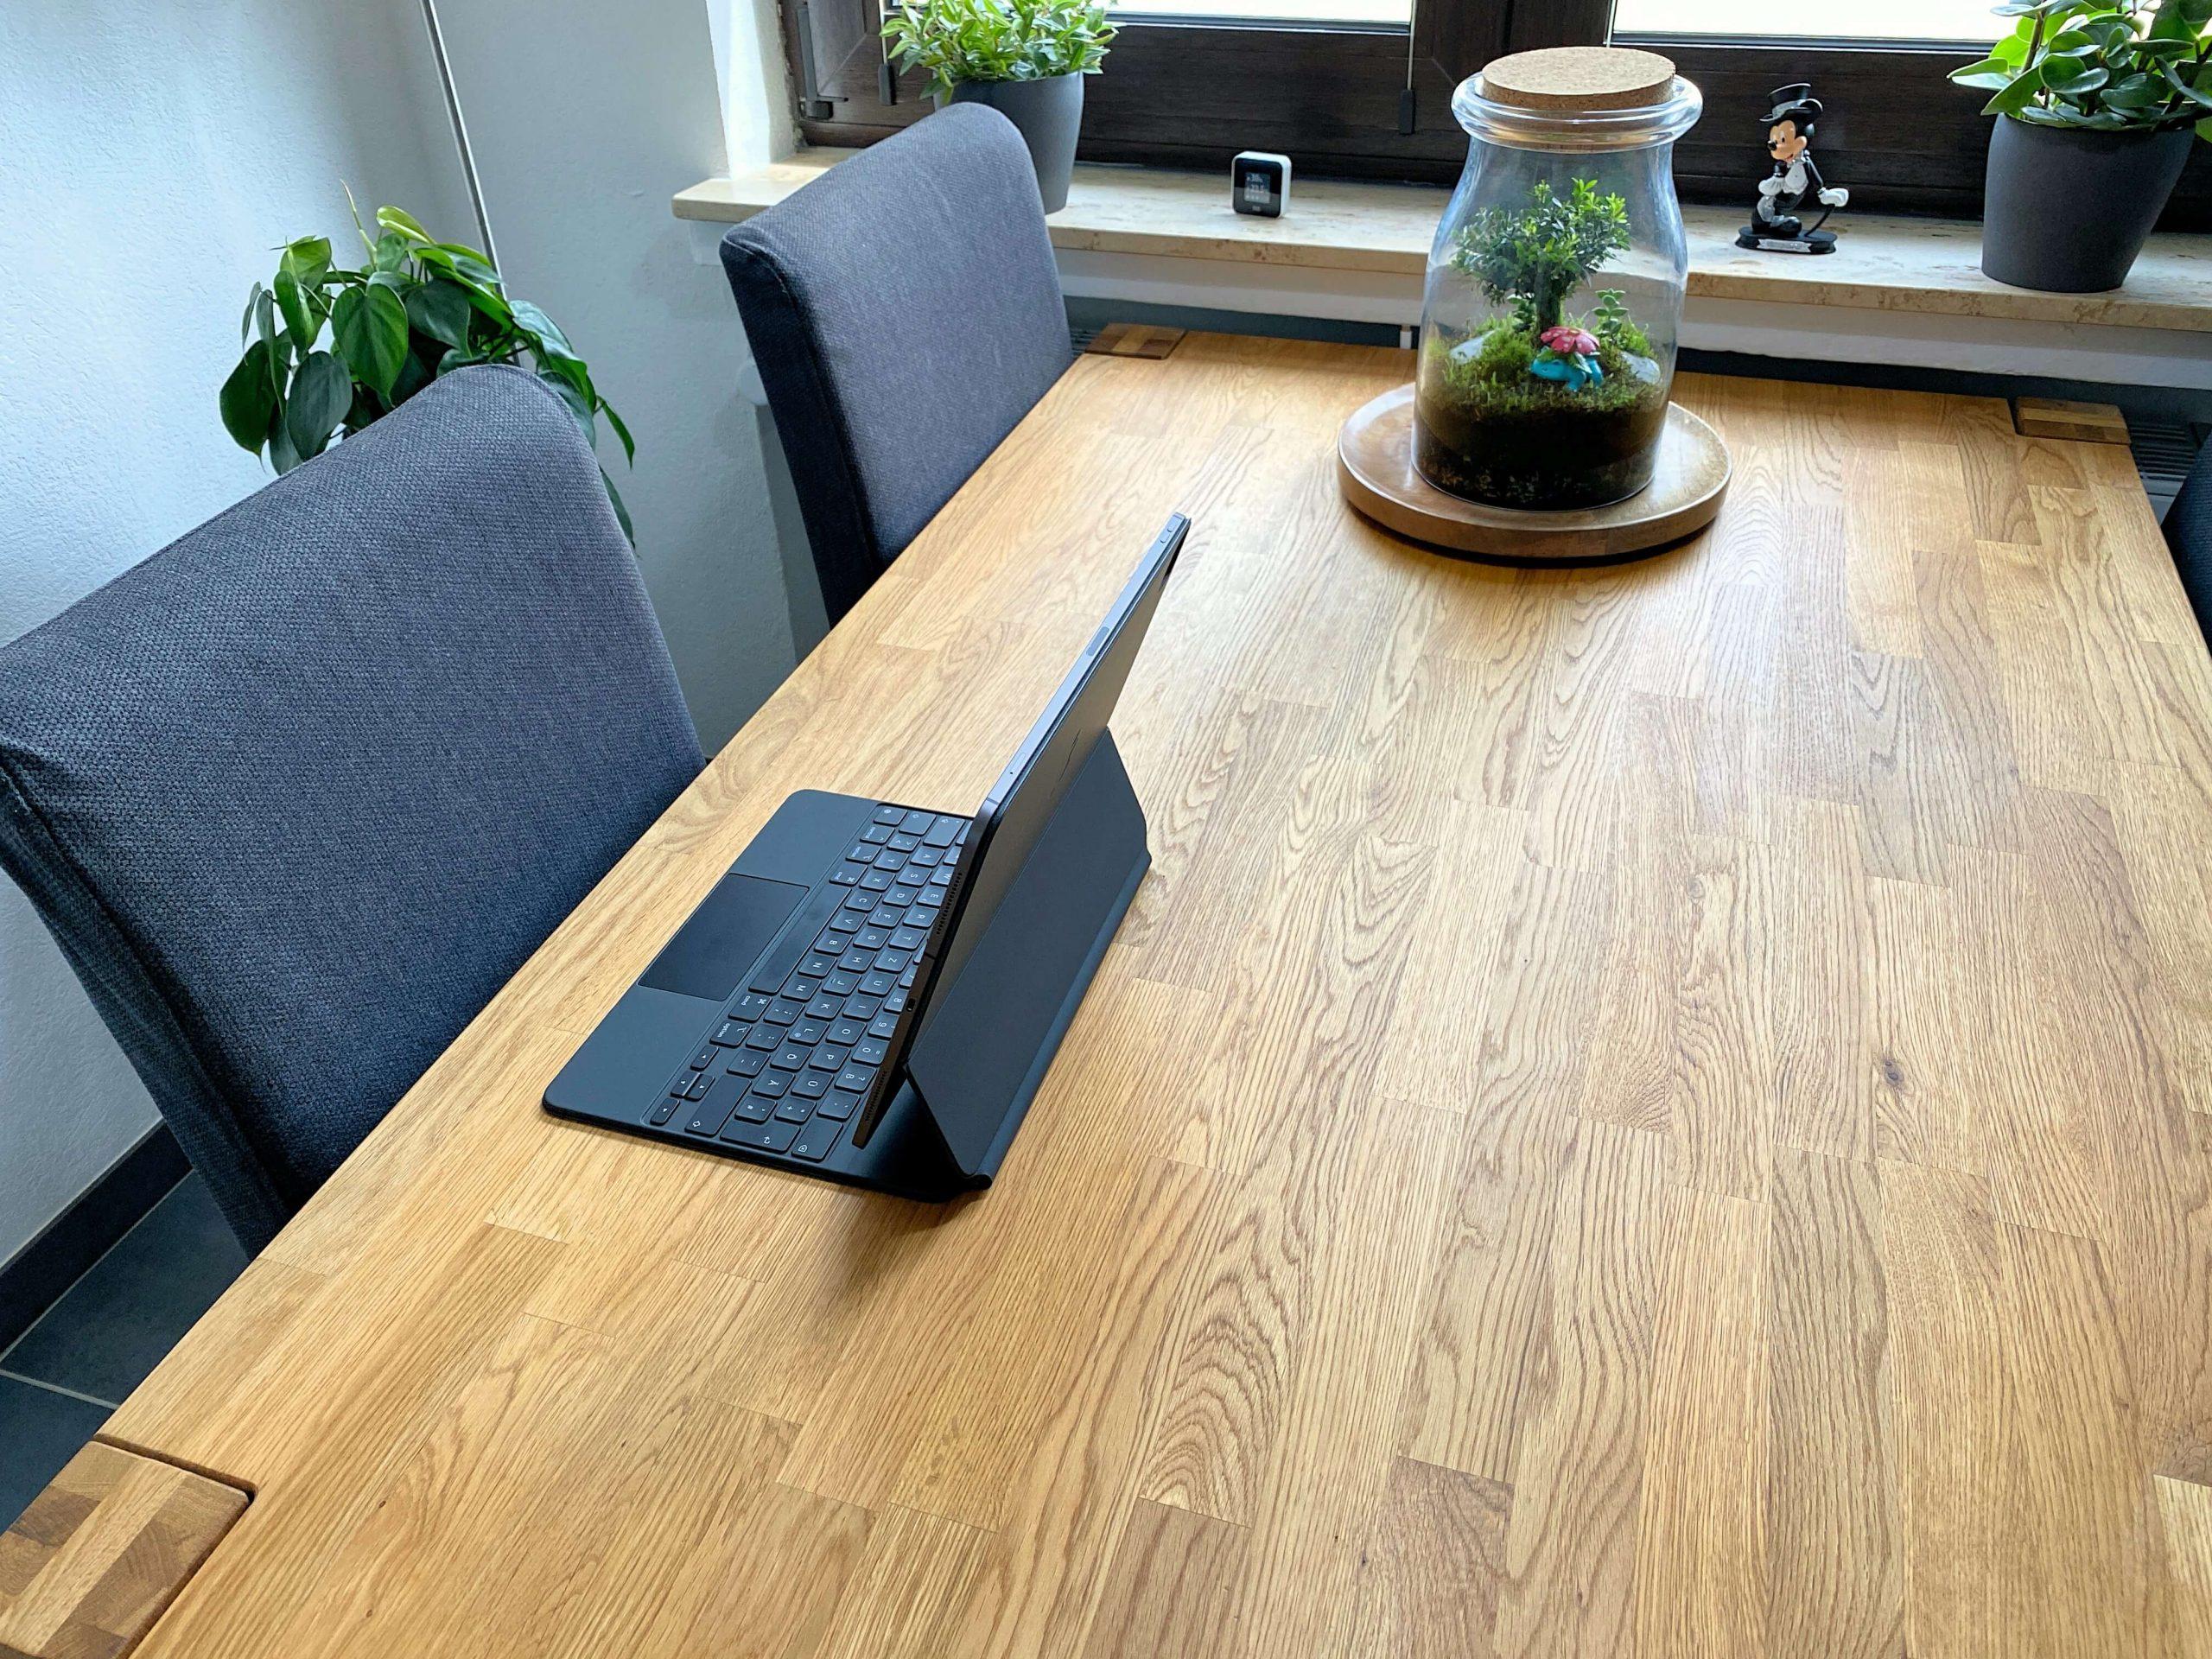 Das-Magic-Keyboard-für-das-iPad-Pro1-scaled Das Magic Keyboard für das iPad Pro